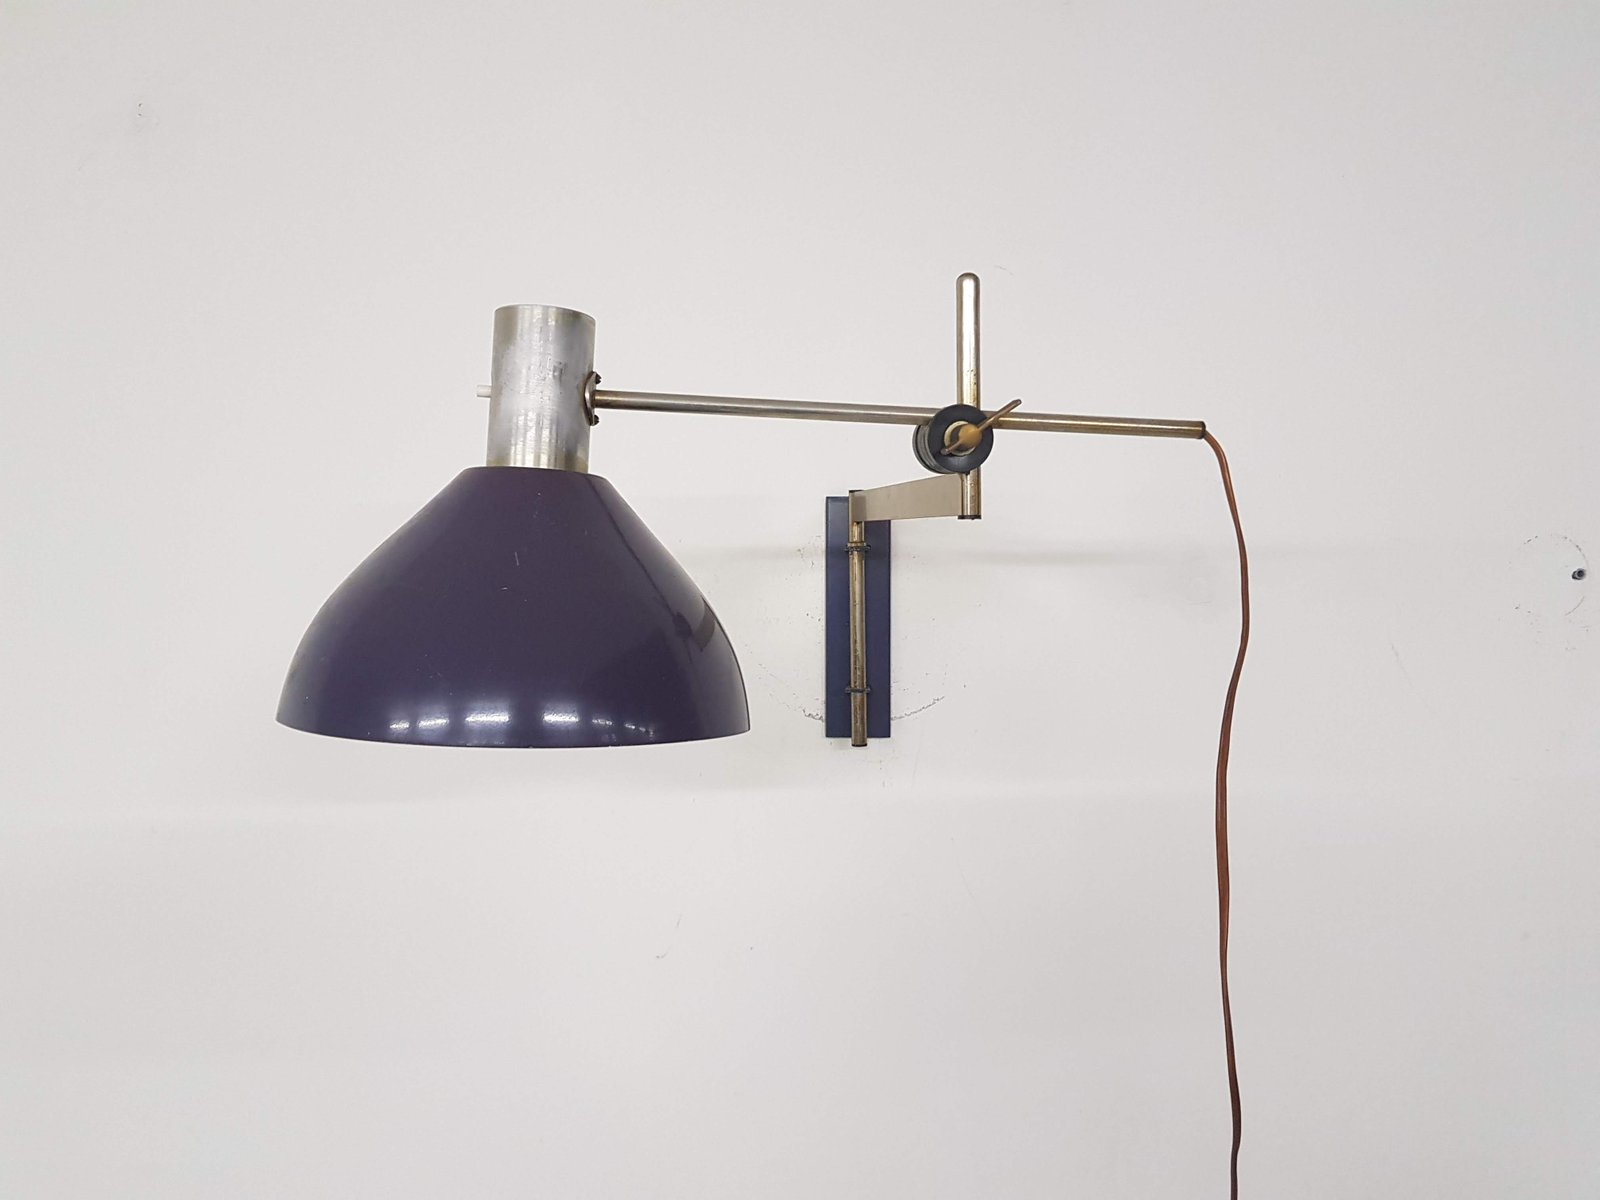 applique murale vintage violette de dijkstra 1960s en vente sur pamono. Black Bedroom Furniture Sets. Home Design Ideas